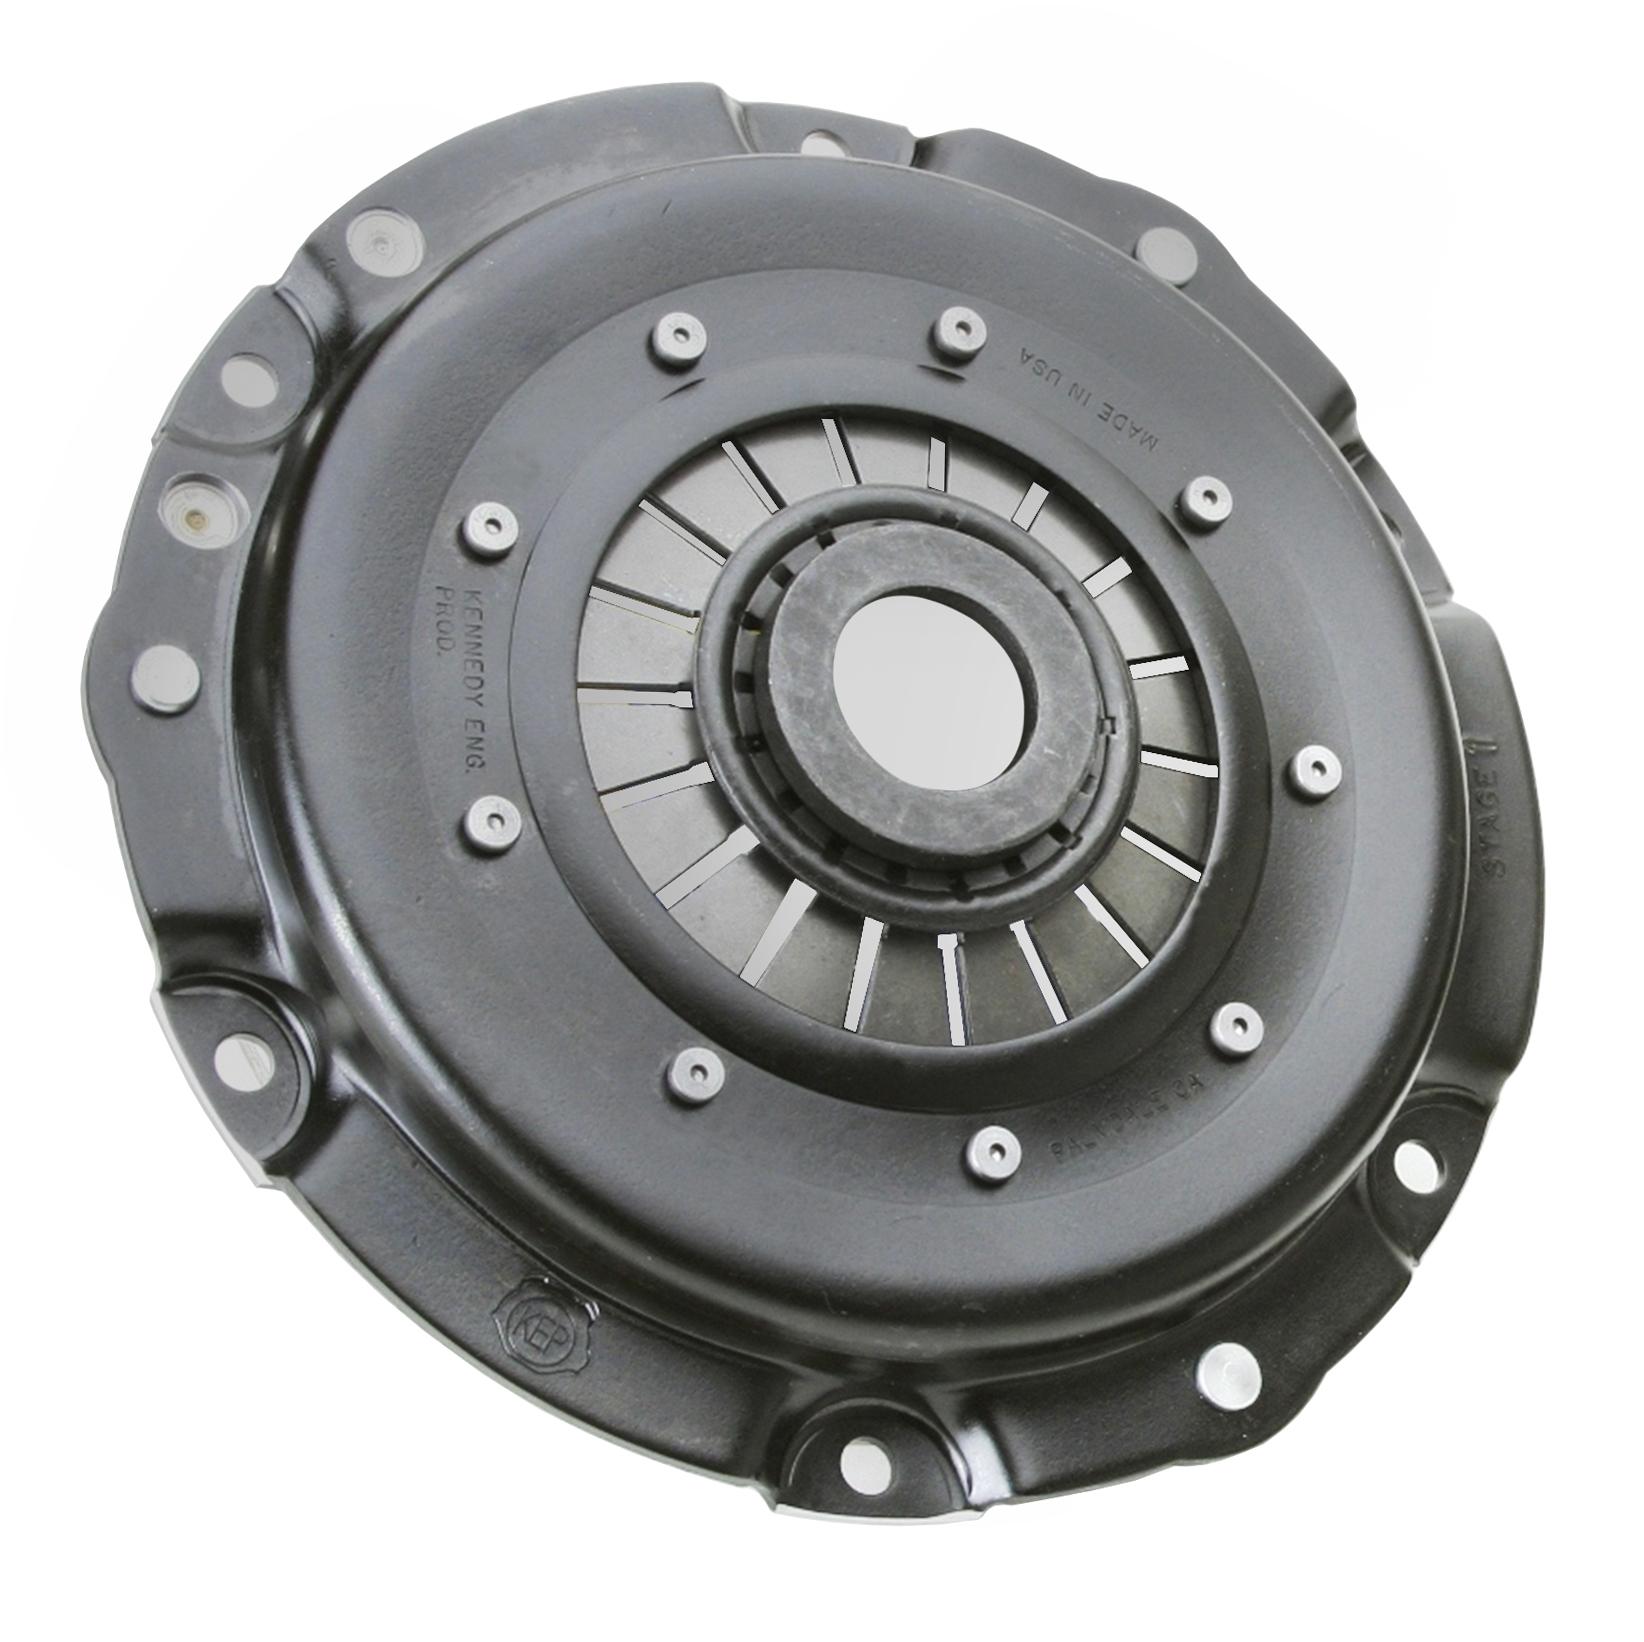 "Kennedy 9"" Clutch Pressure Plates"